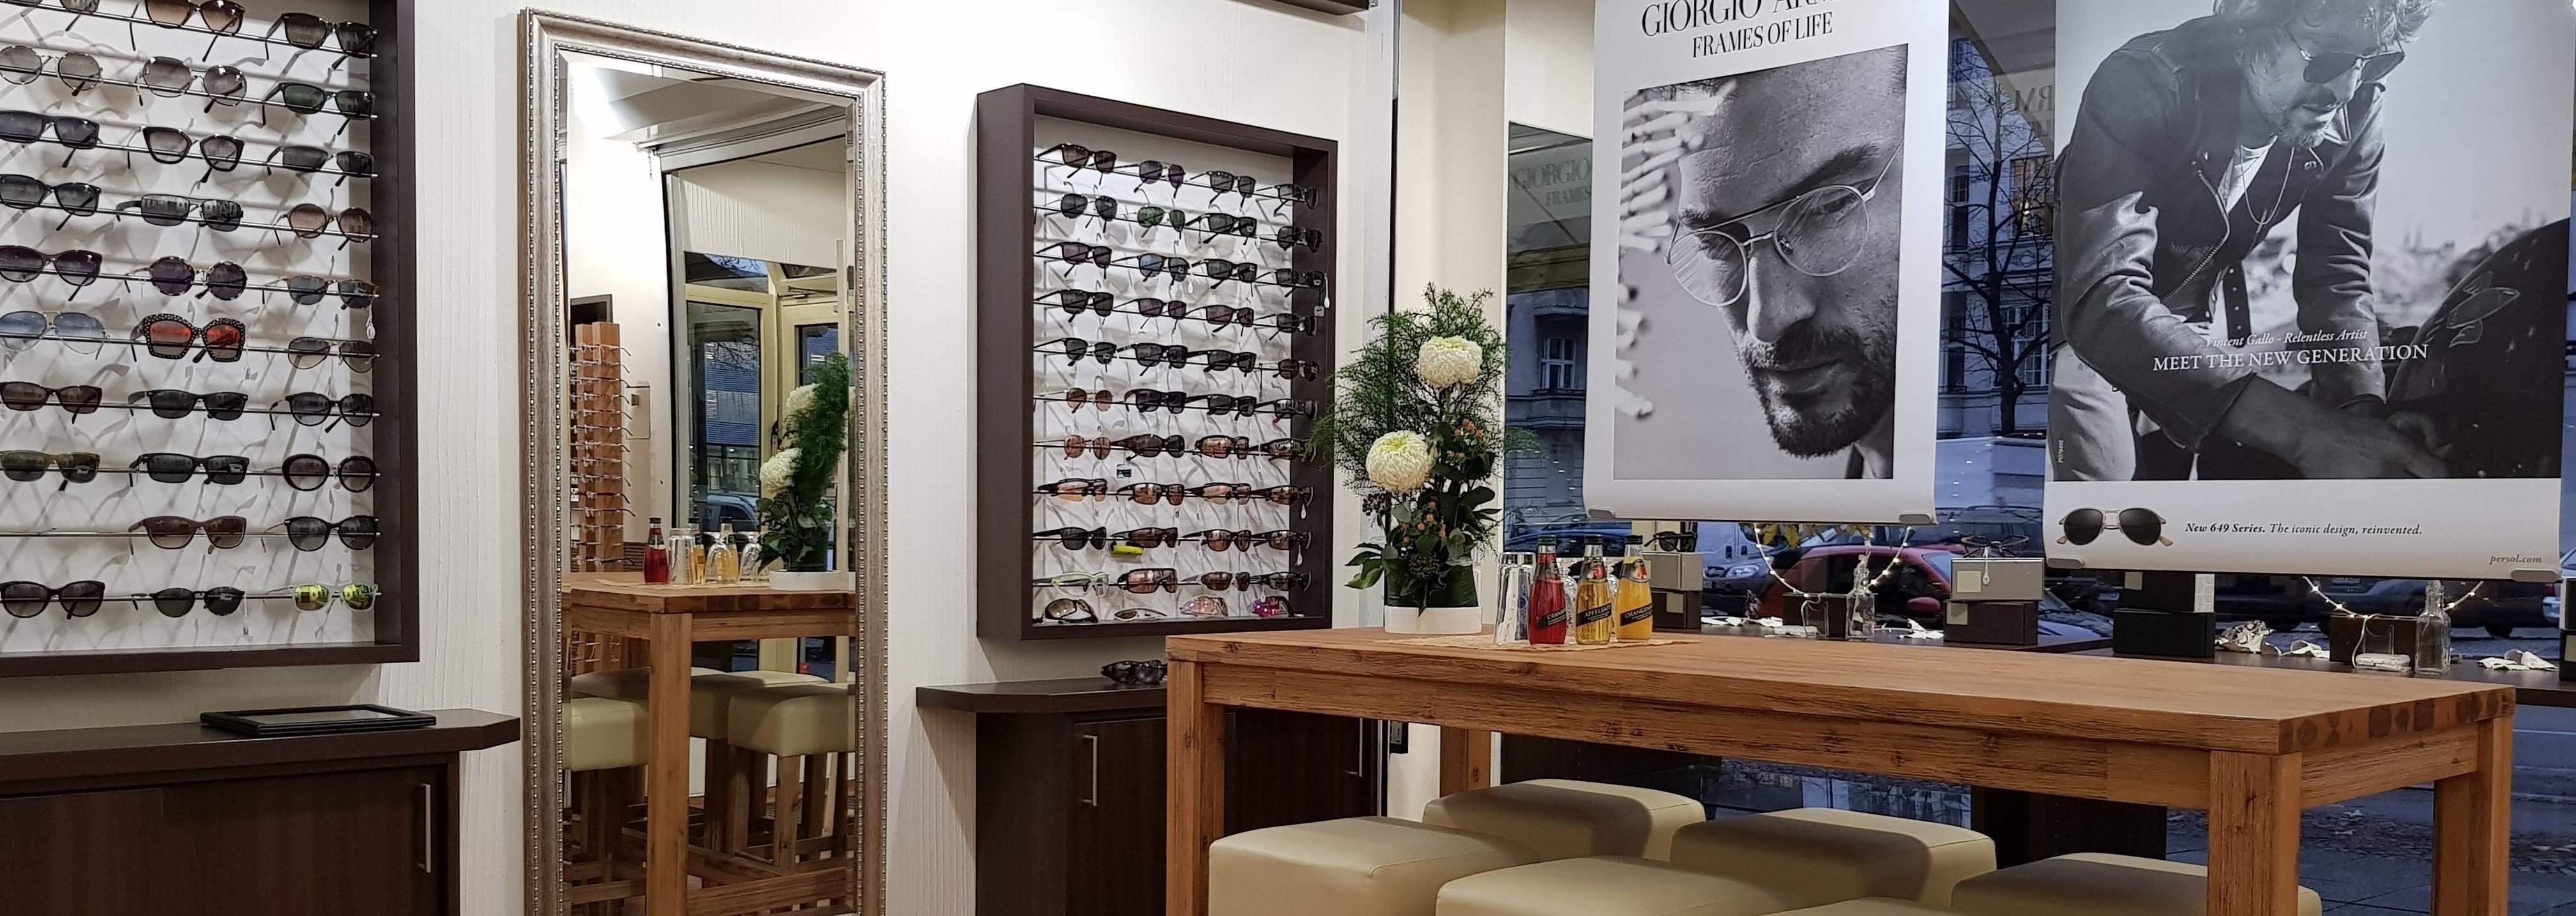 Kinderbrillen › Optiker Wittig GmbH